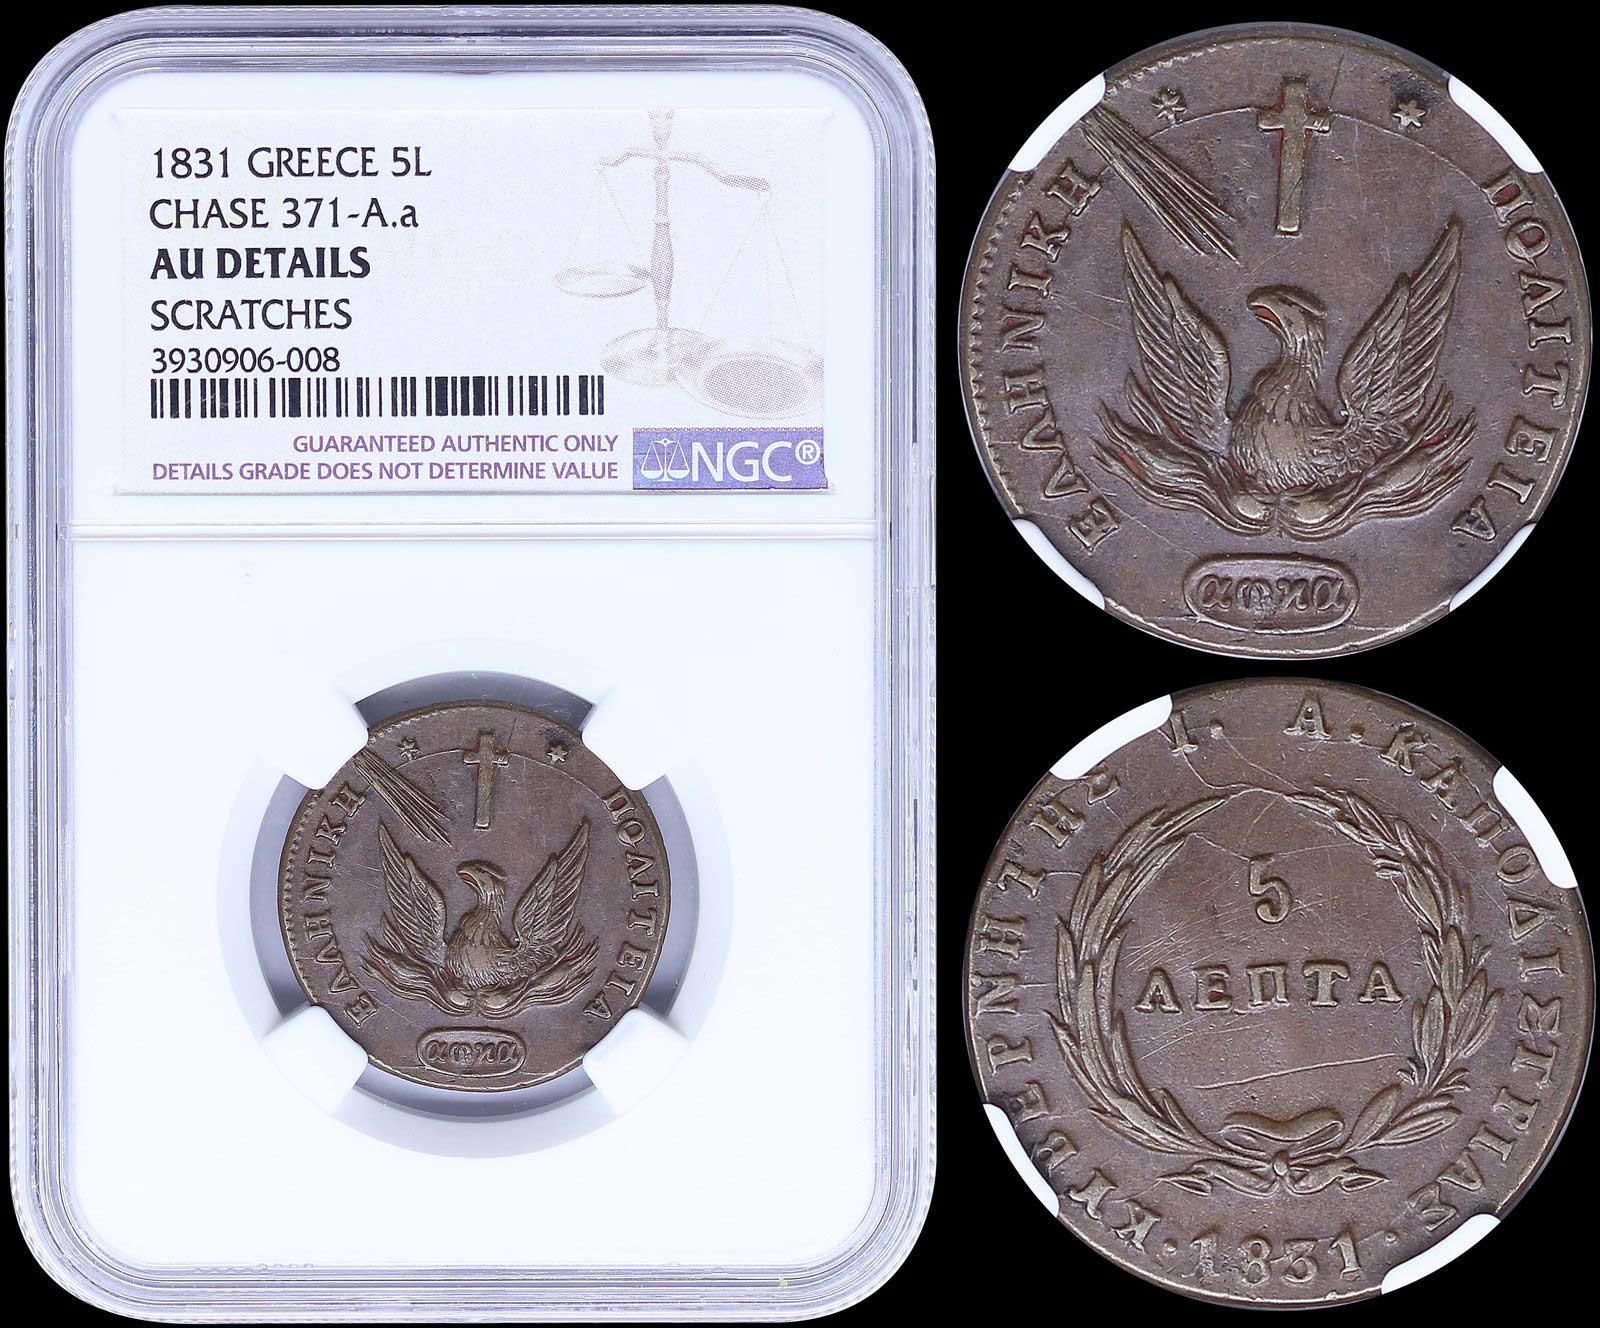 Lot 9026 - GREECE-  COINS & TOKENS governor capodistrias -  A. Karamitsos Public & LIVE Bid Auction 610 Coins, Medals & Banknotes